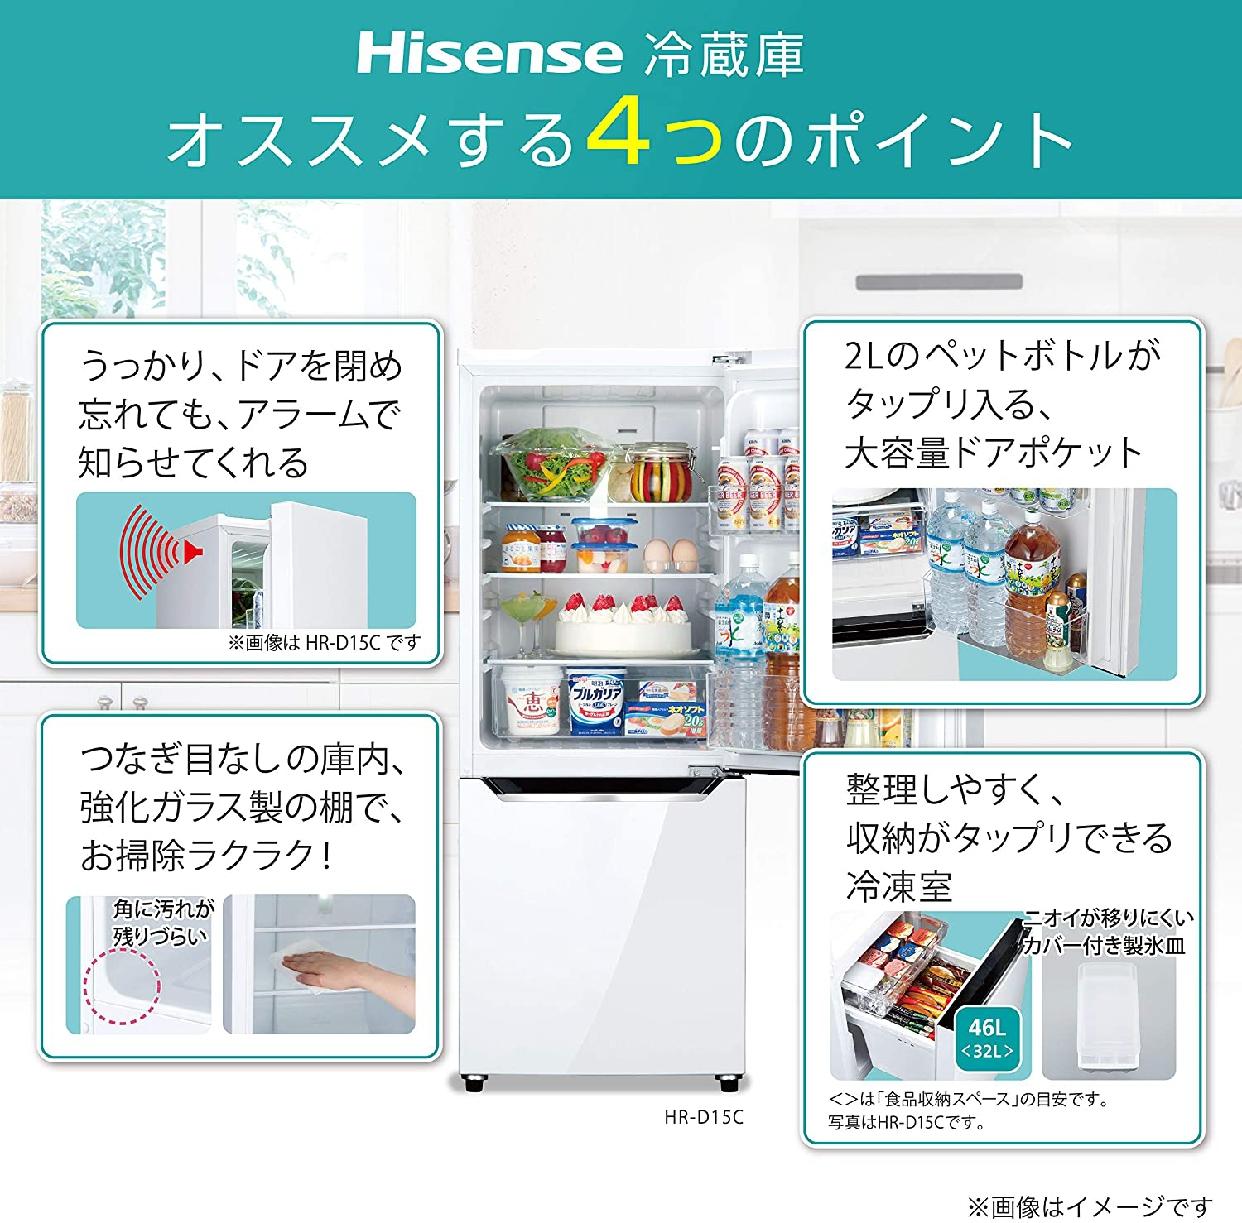 Hisense(ハイセンス)93L 冷凍冷蔵庫 HR-B95Aの商品画像8